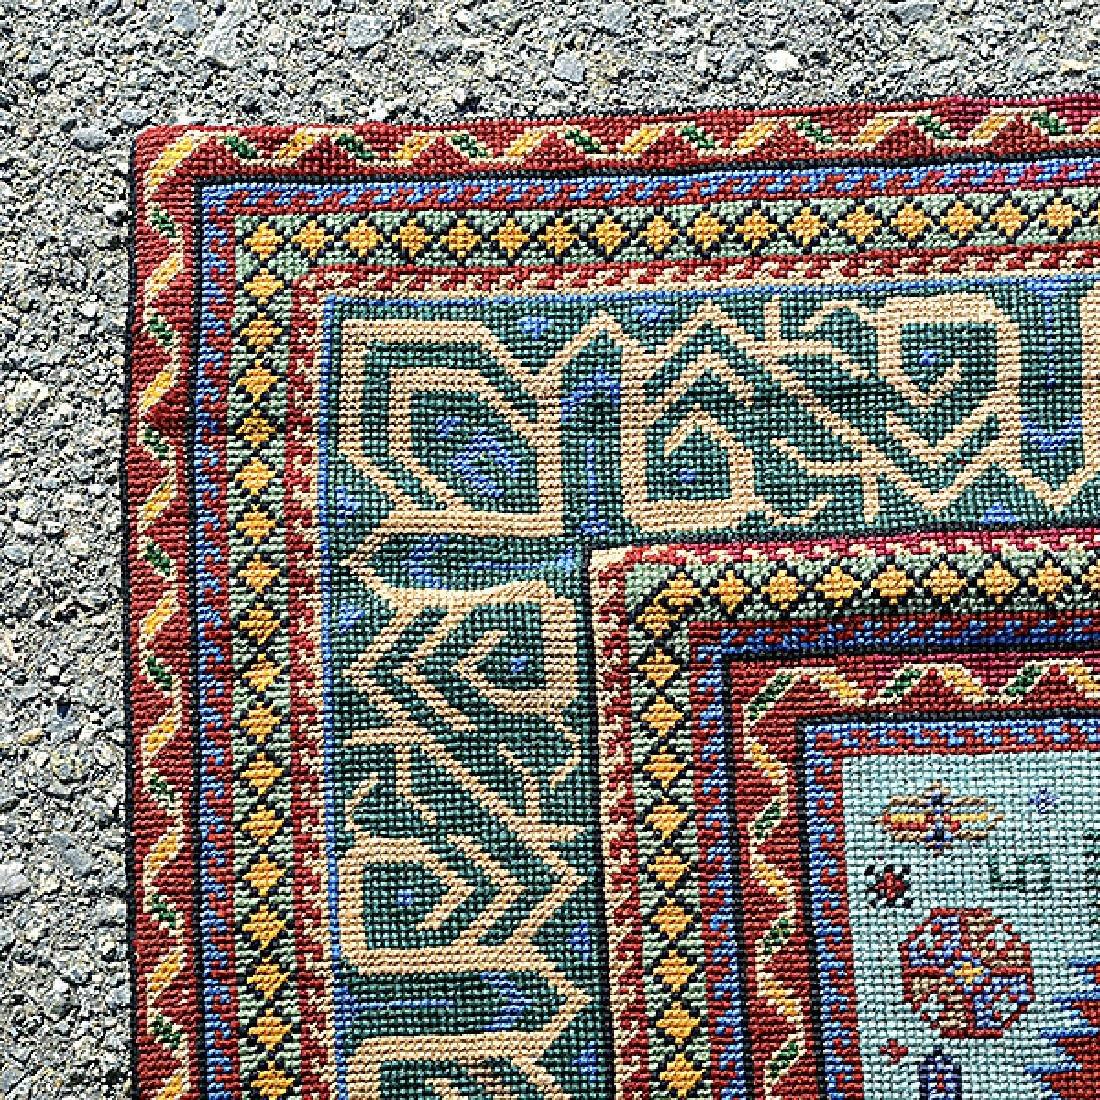 Kazak Souzani Needlework Rug: 4 feet 1 inch x 7 feet - 2